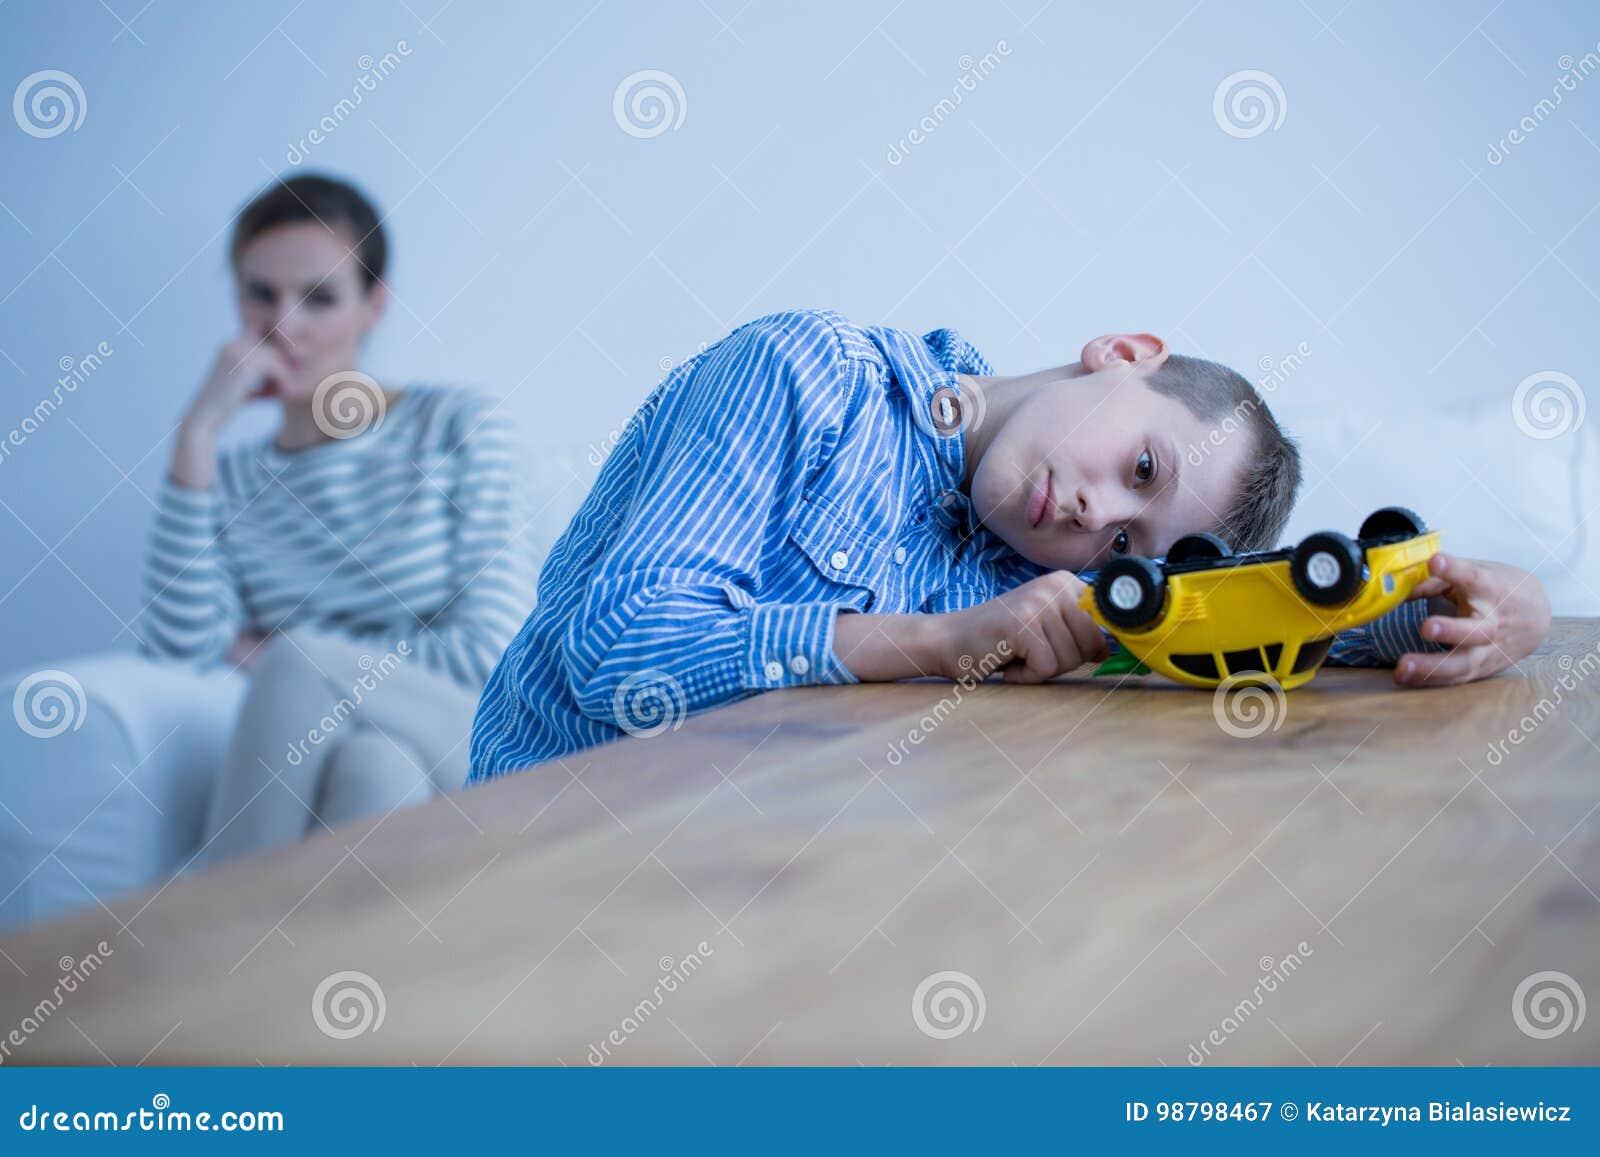 Sad boy sick of autism